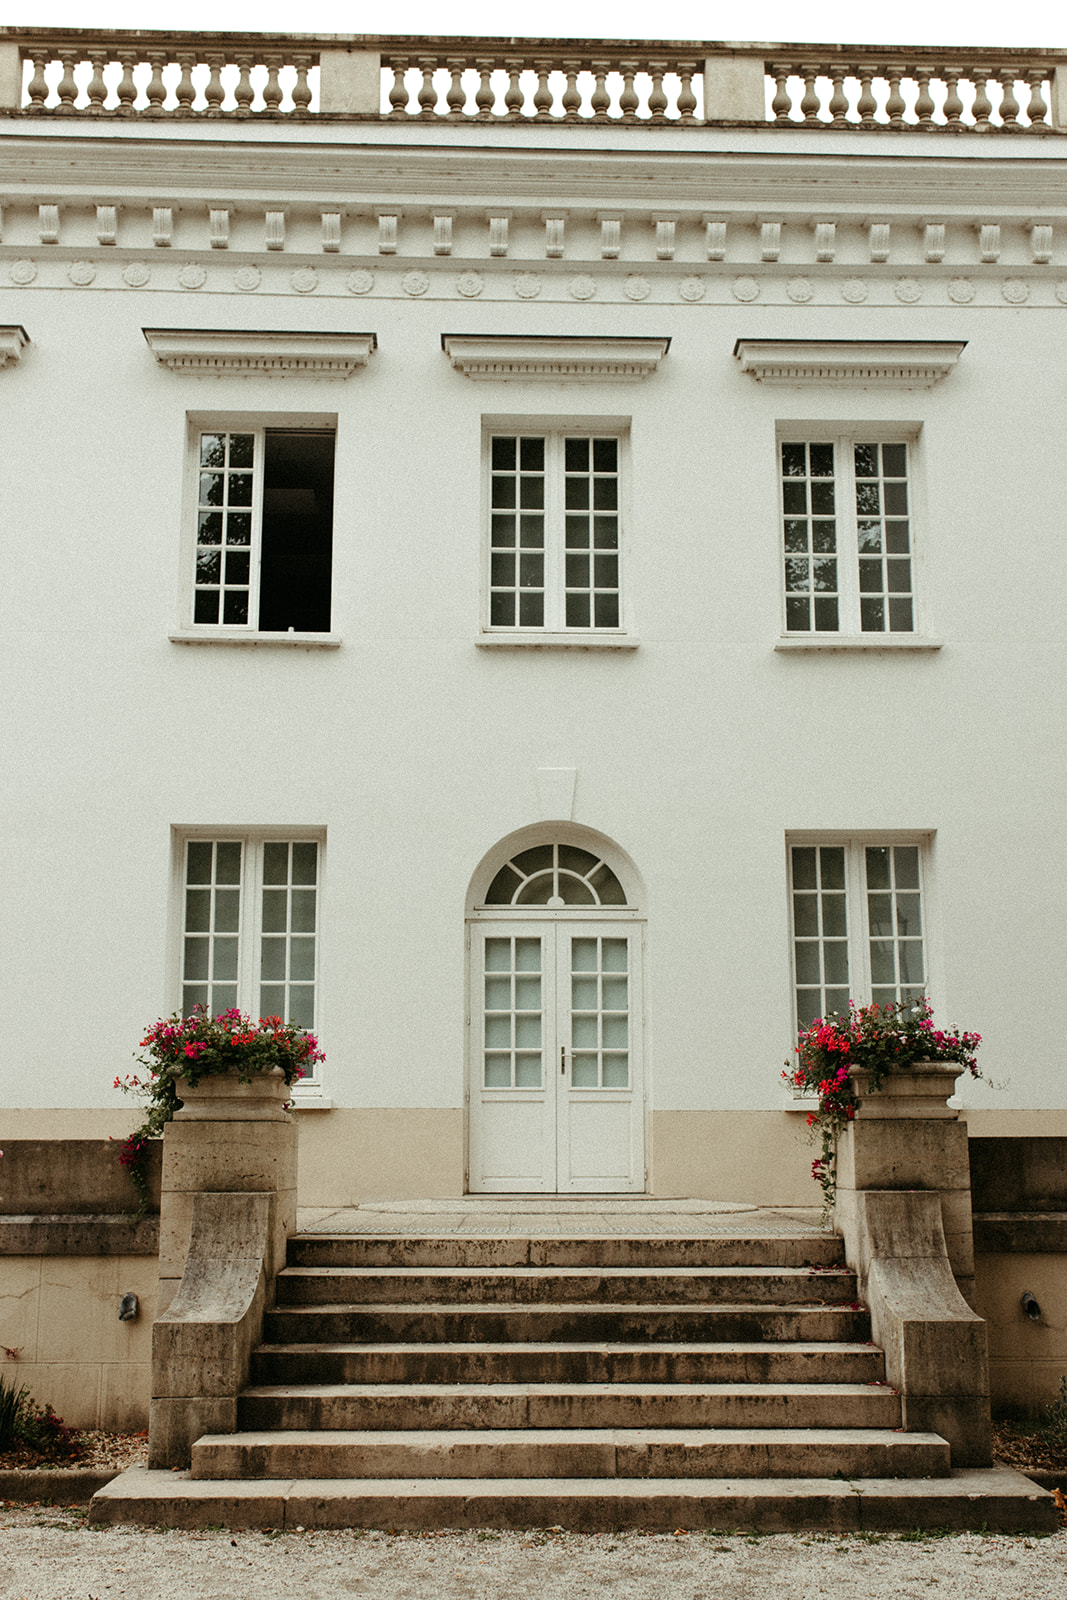 UTOPICLOVERS20200627 – Mariage Civil Manon Florian  4378 - Le mariage civil de Manon et Florian dans les Yvelines.